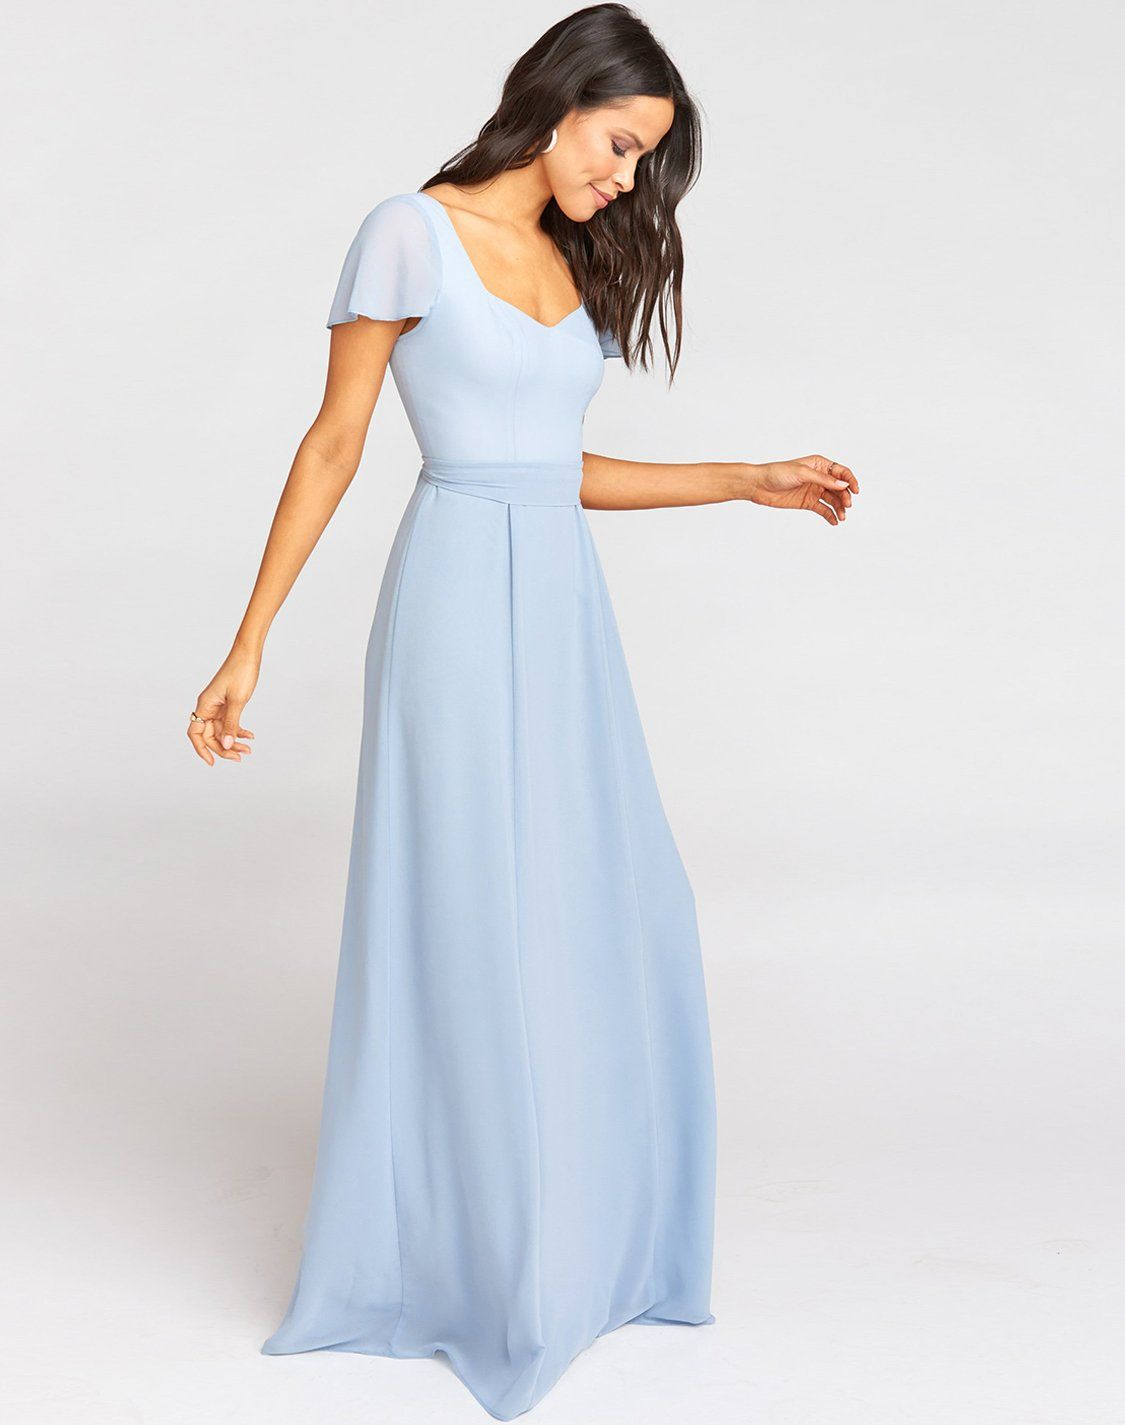 Marie Sweetheart Maxi Dress Steel Blue Chiffon In 2020 Sweetheart Dress Dresses Sweetheart [ 1425 x 1125 Pixel ]